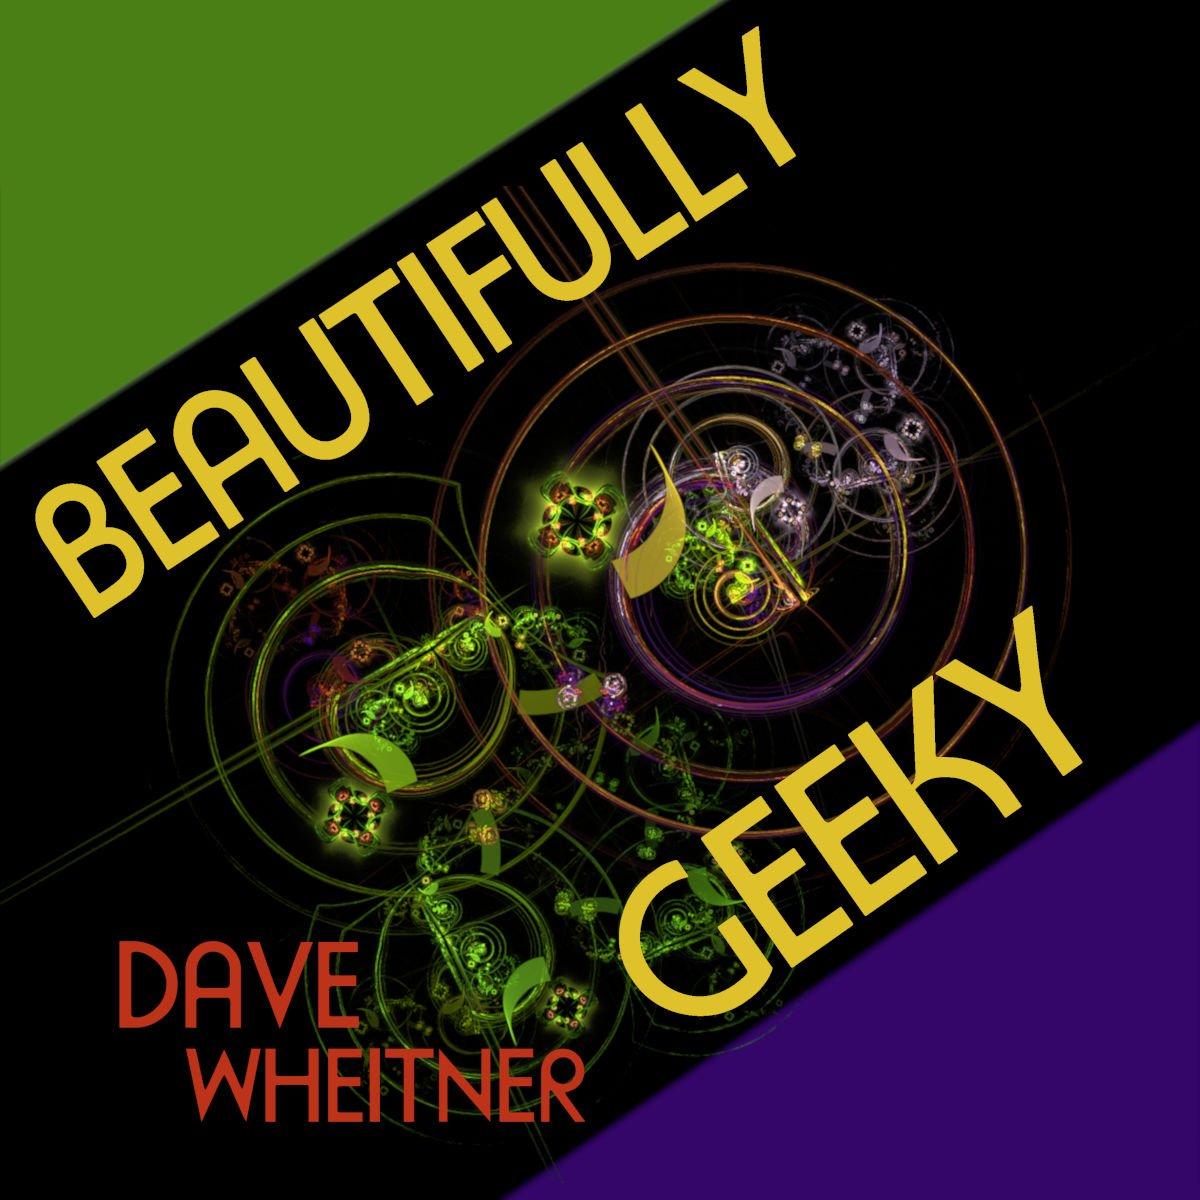 Beautifully Geeky album cover art